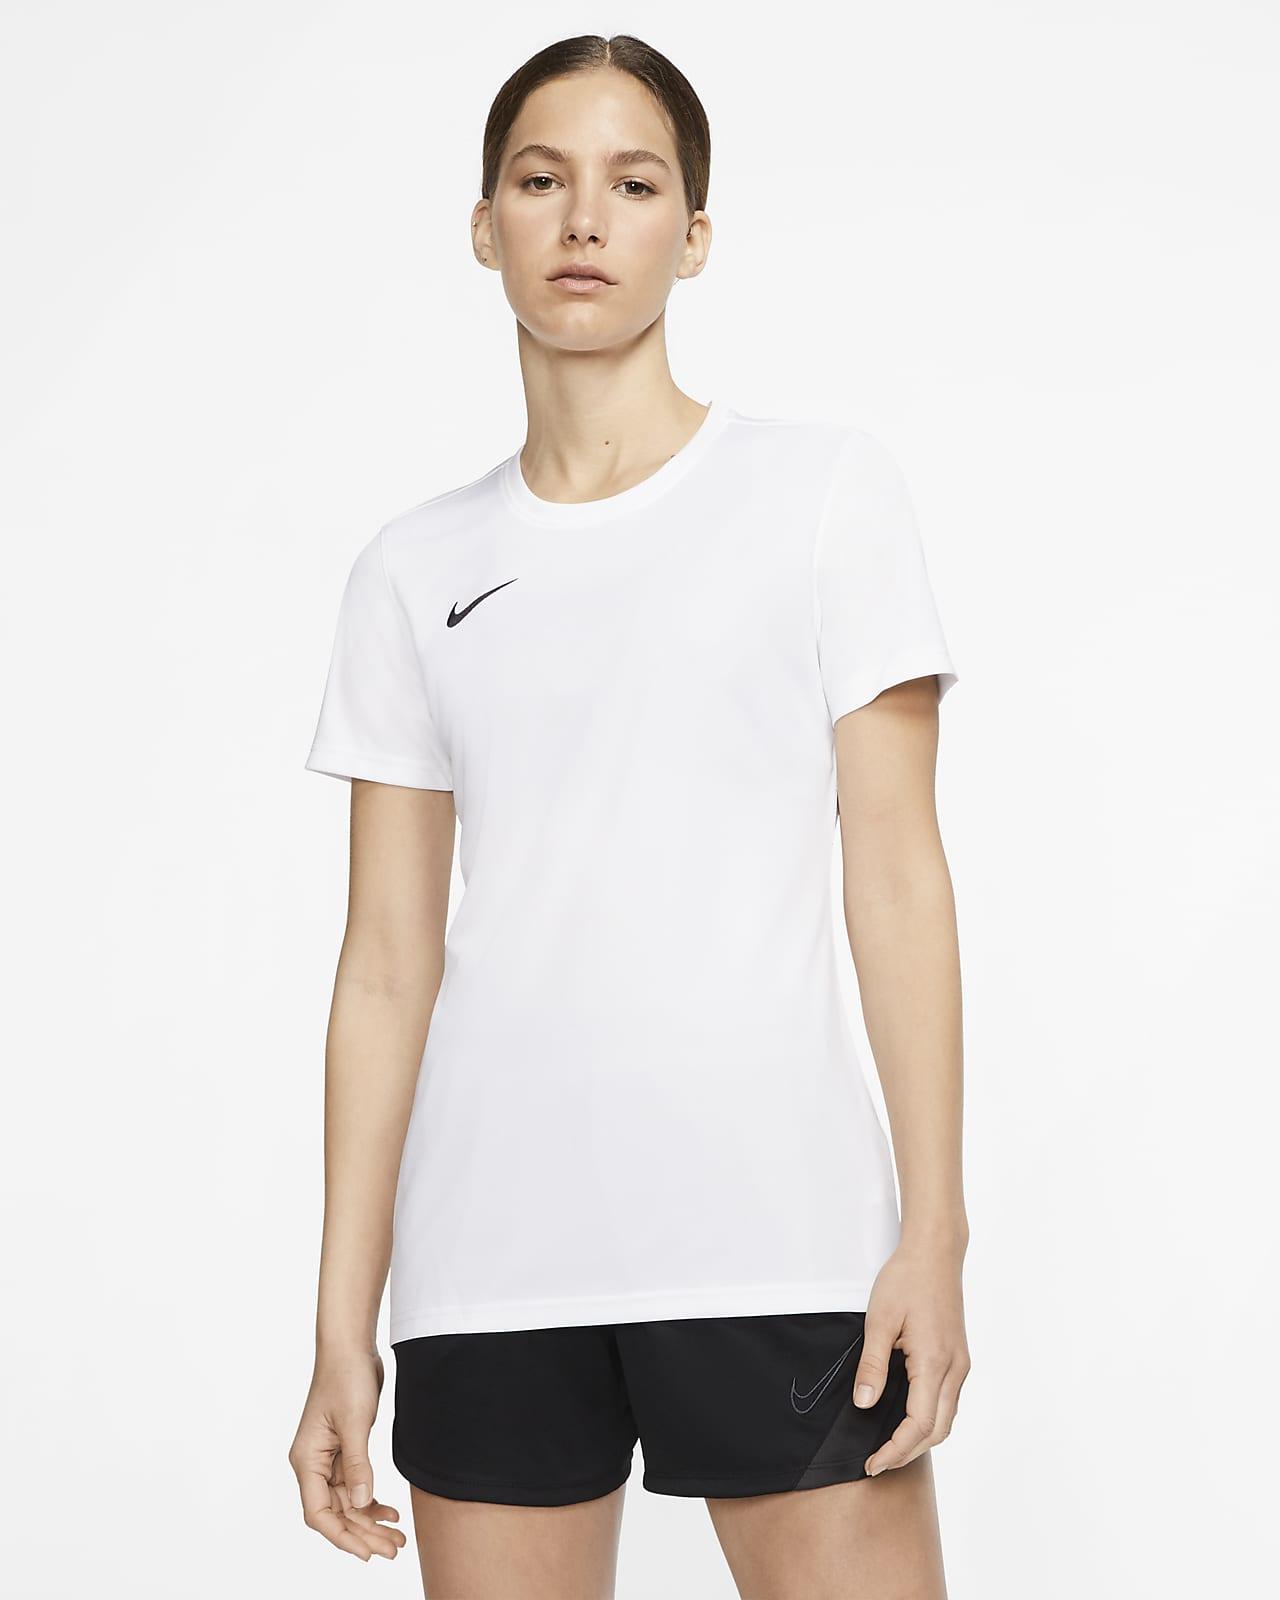 Camisola de futebol Nike Dri-FIT Park 7 para mulher